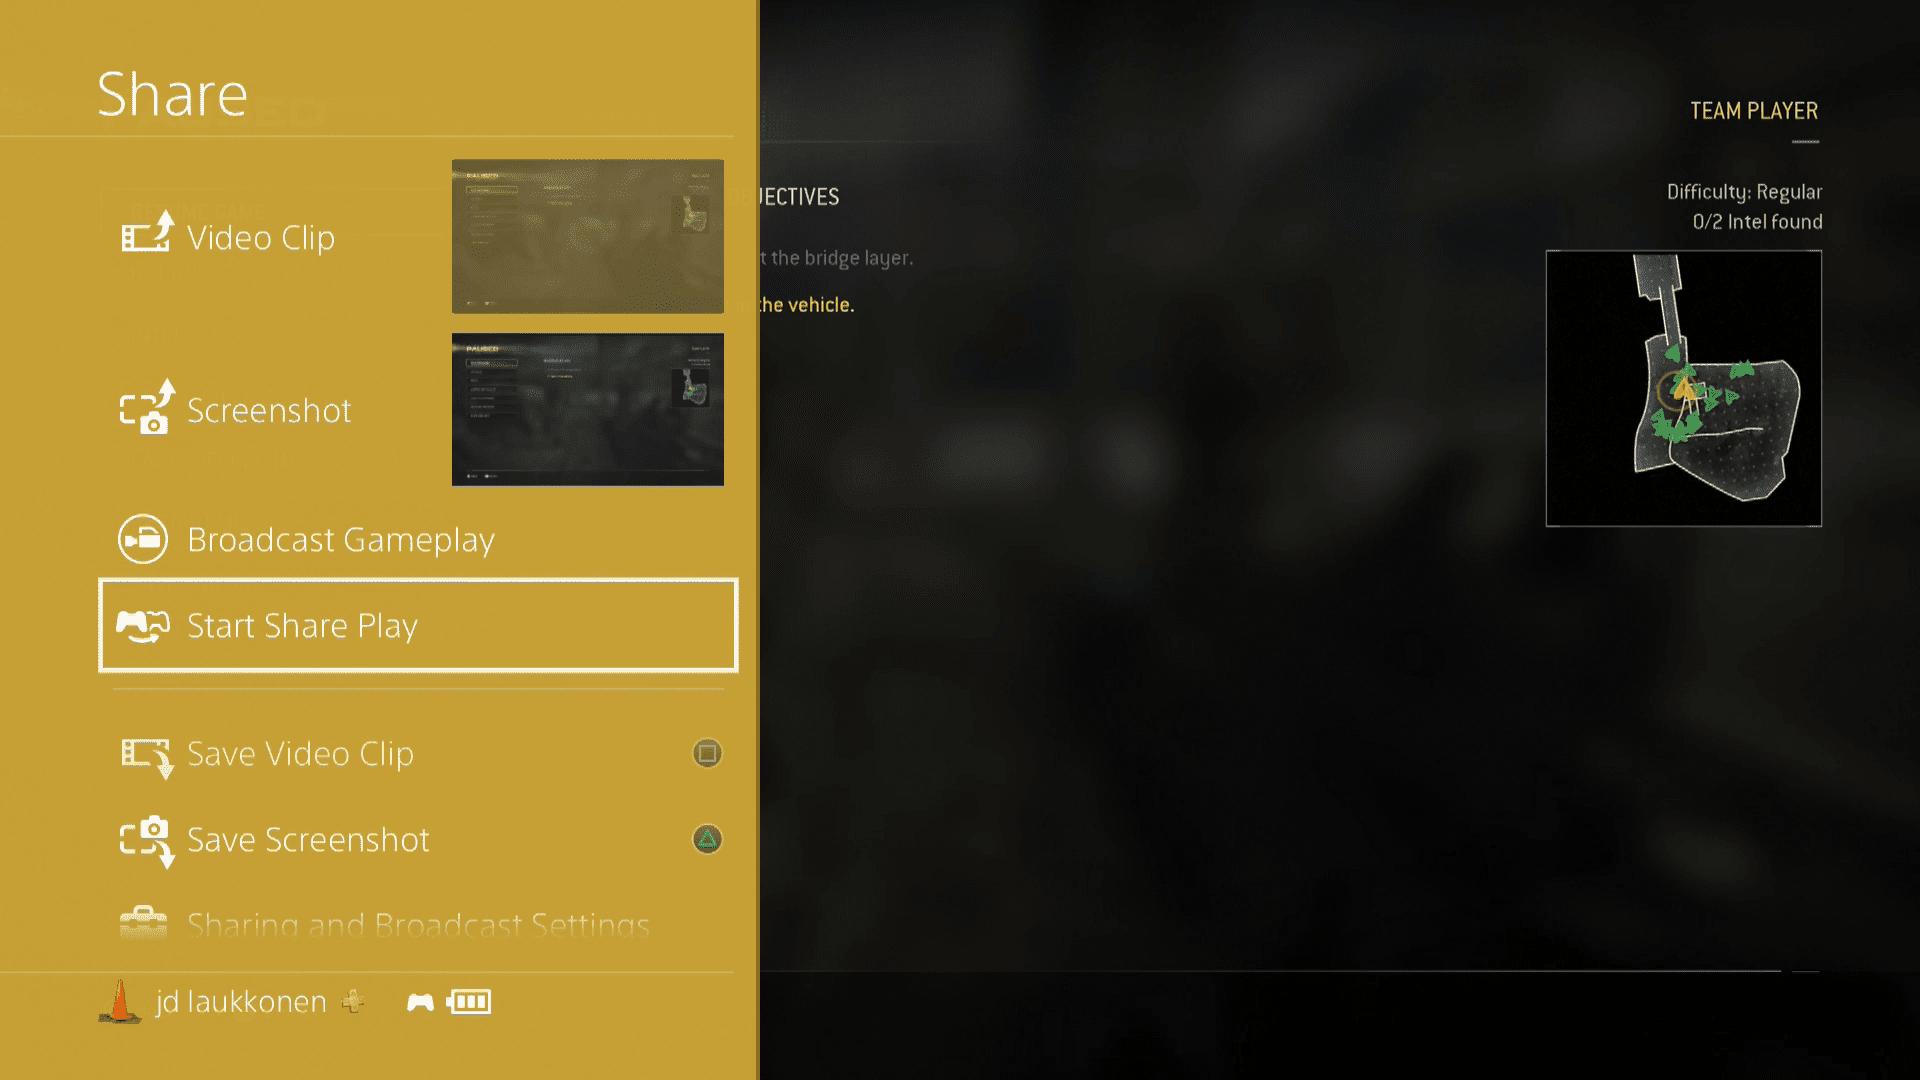 A screenshot of the PS4 Share menu.